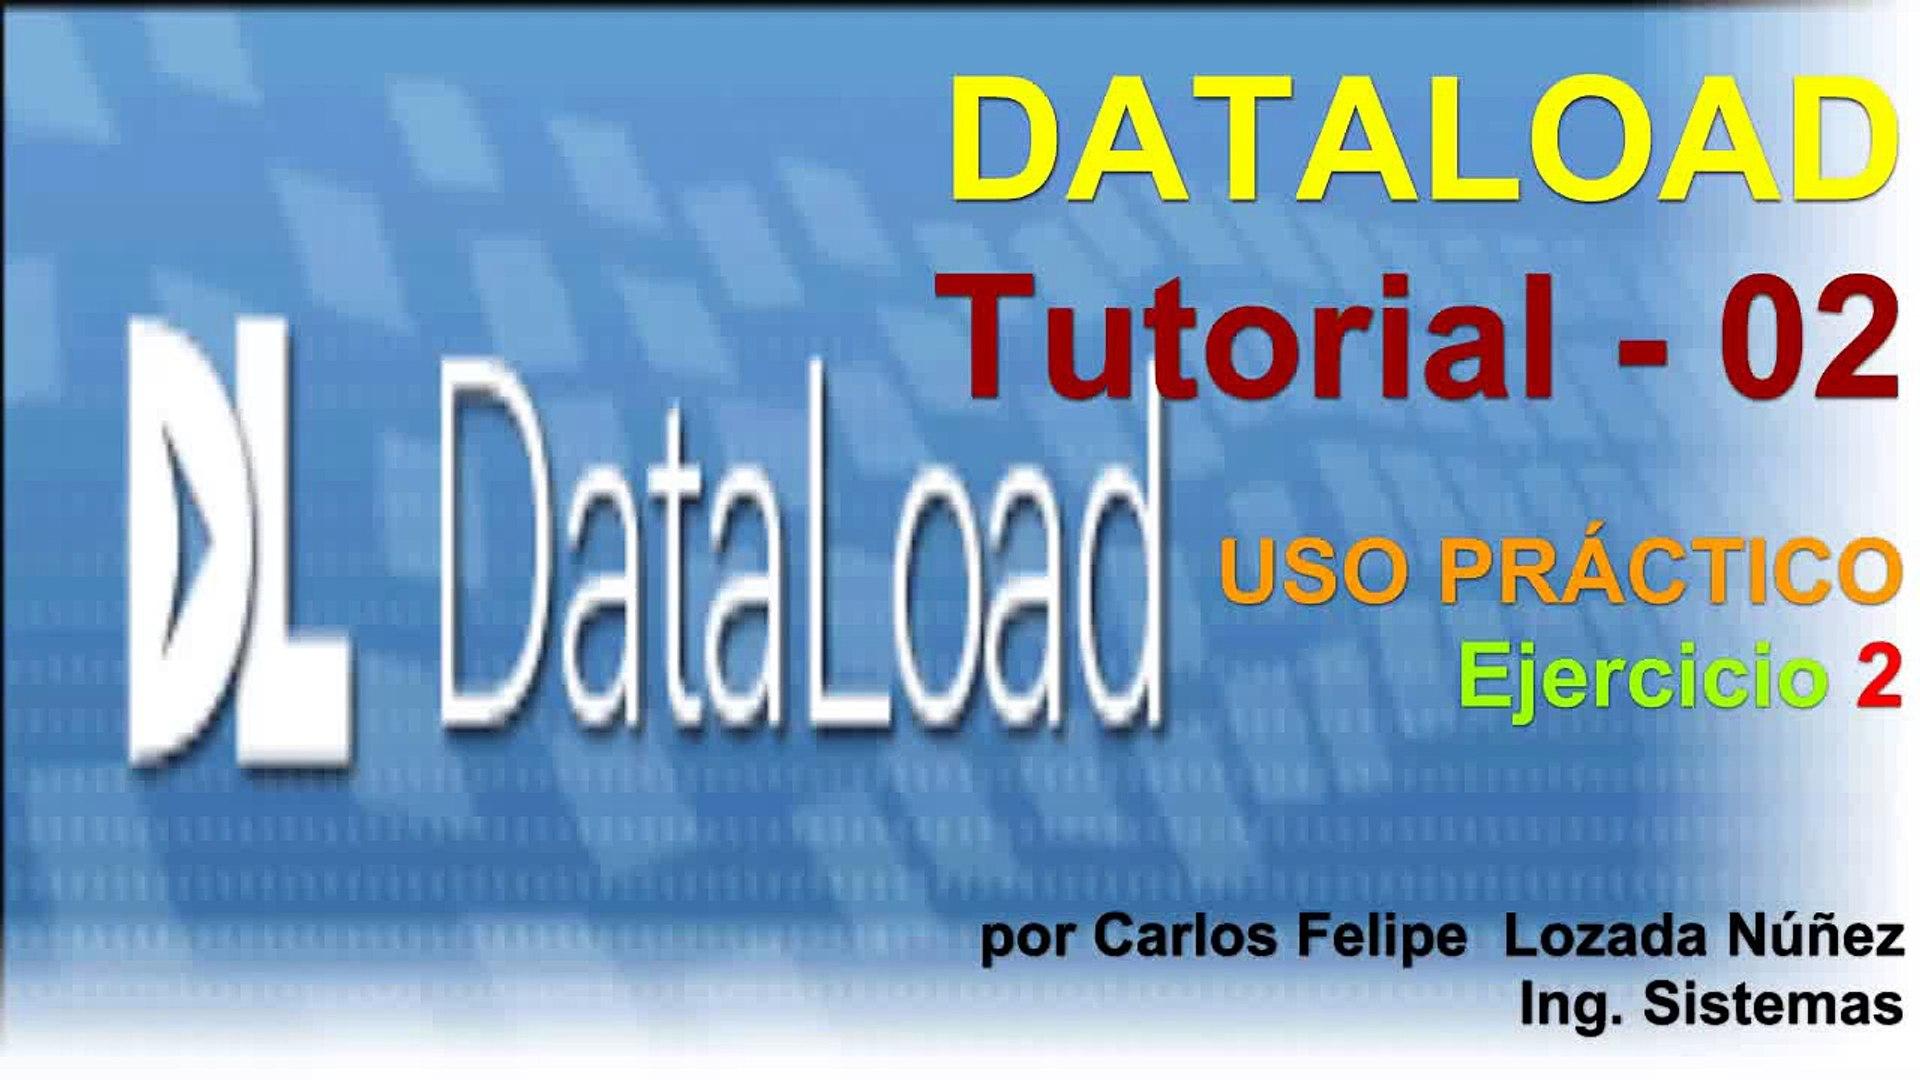 Dataload Tutorial 02 - Ejercicio 02 - PeopleNet Meta4